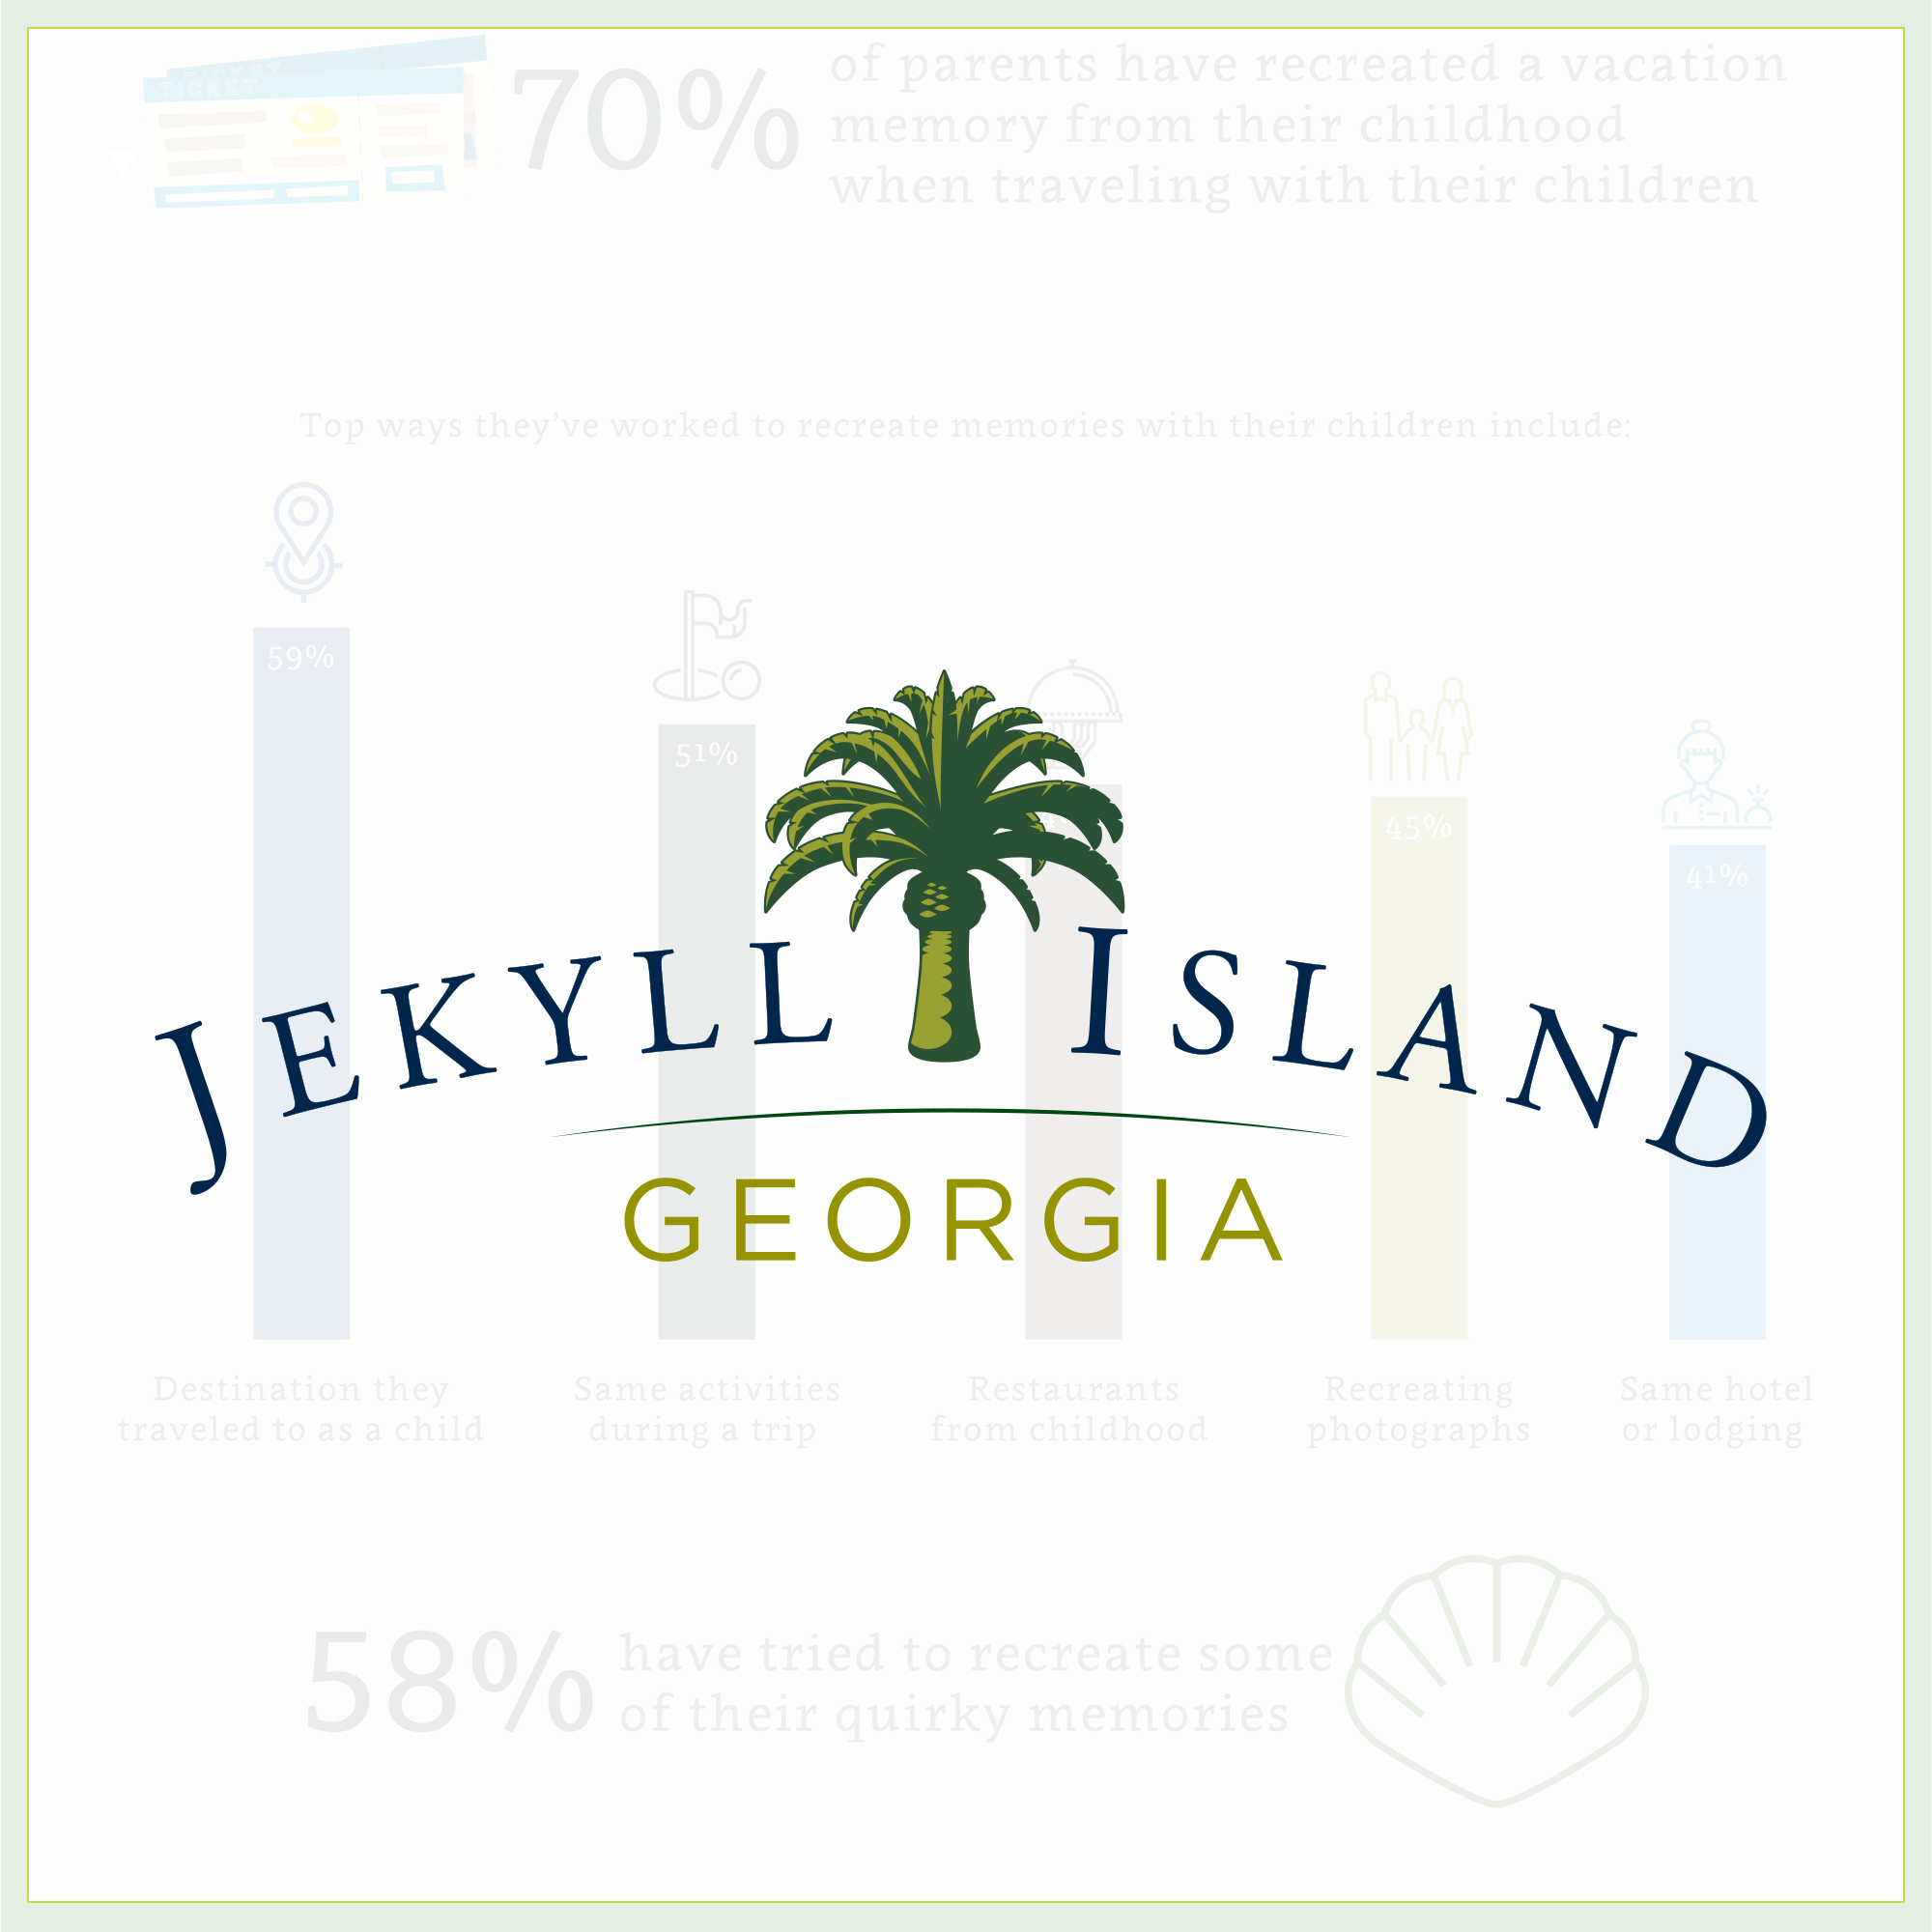 jekkyl-island.jpg